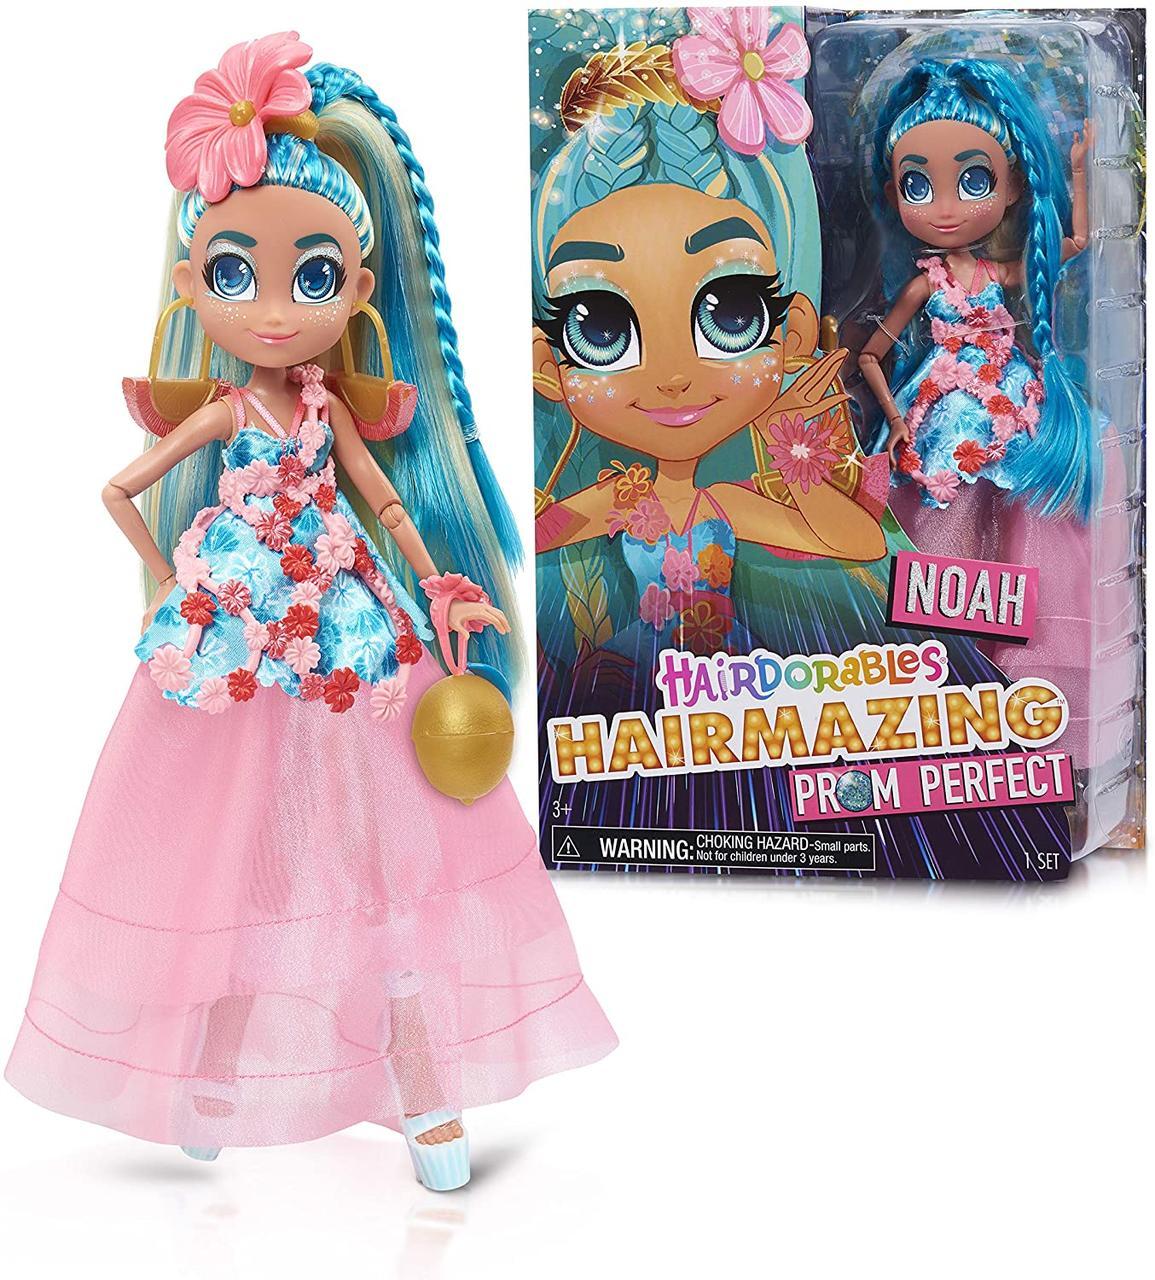 Велика Лялька Хэрдораблс Ноа 26 см Випускний бал Hairdorables Hairmazing Noah Fashion Doll